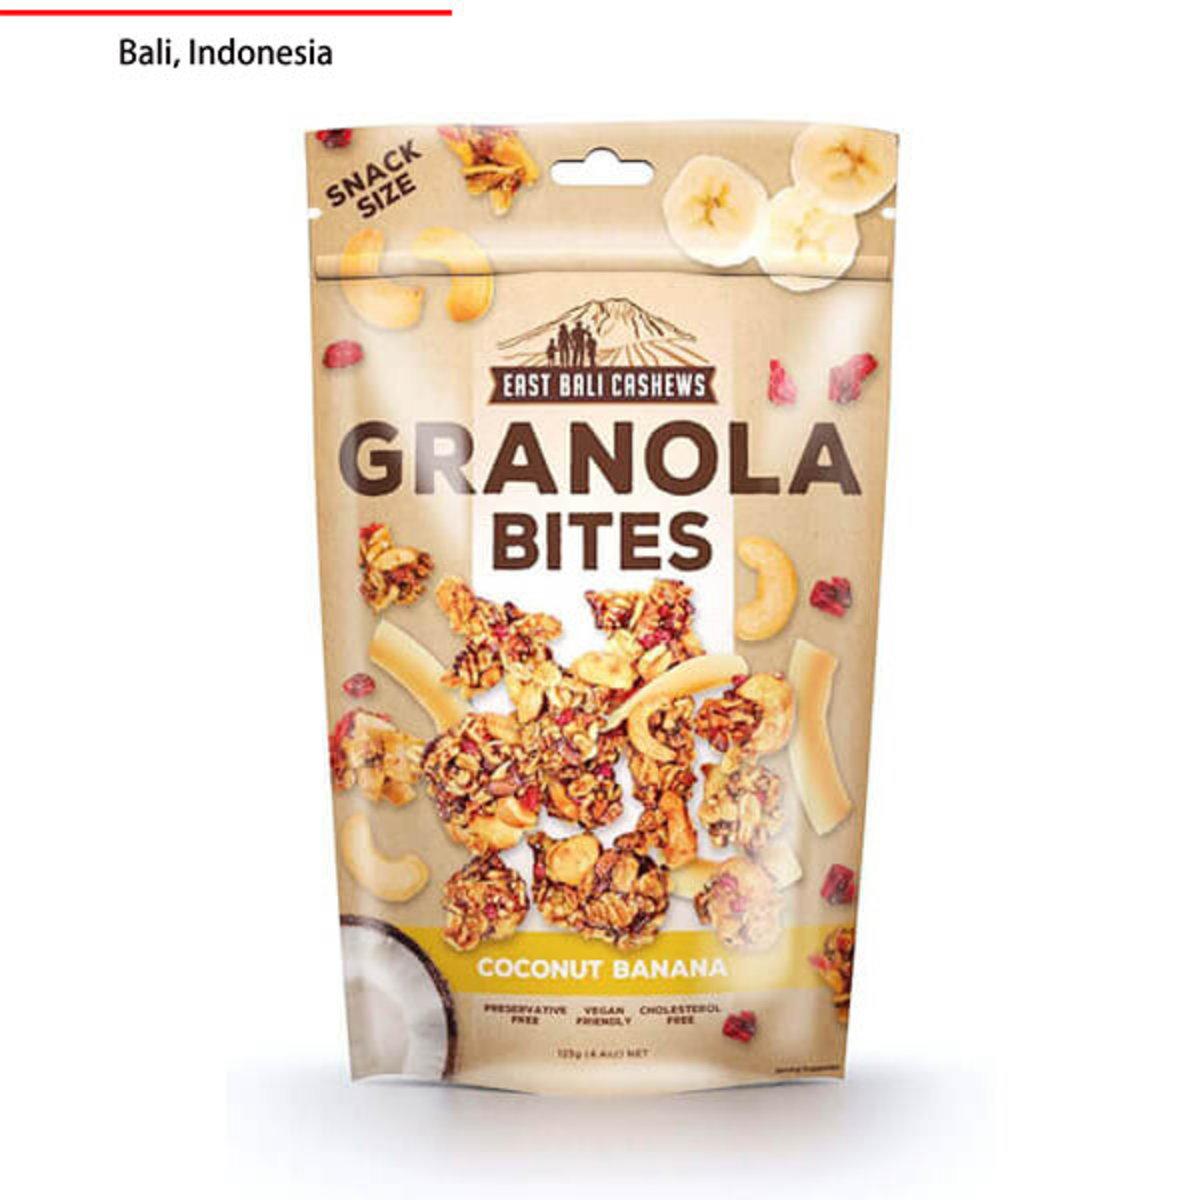 Gluten Free Granola Bites - Coconut Banana - 125g - Preservative Free - Cholesterol Free - Vegan Friendly